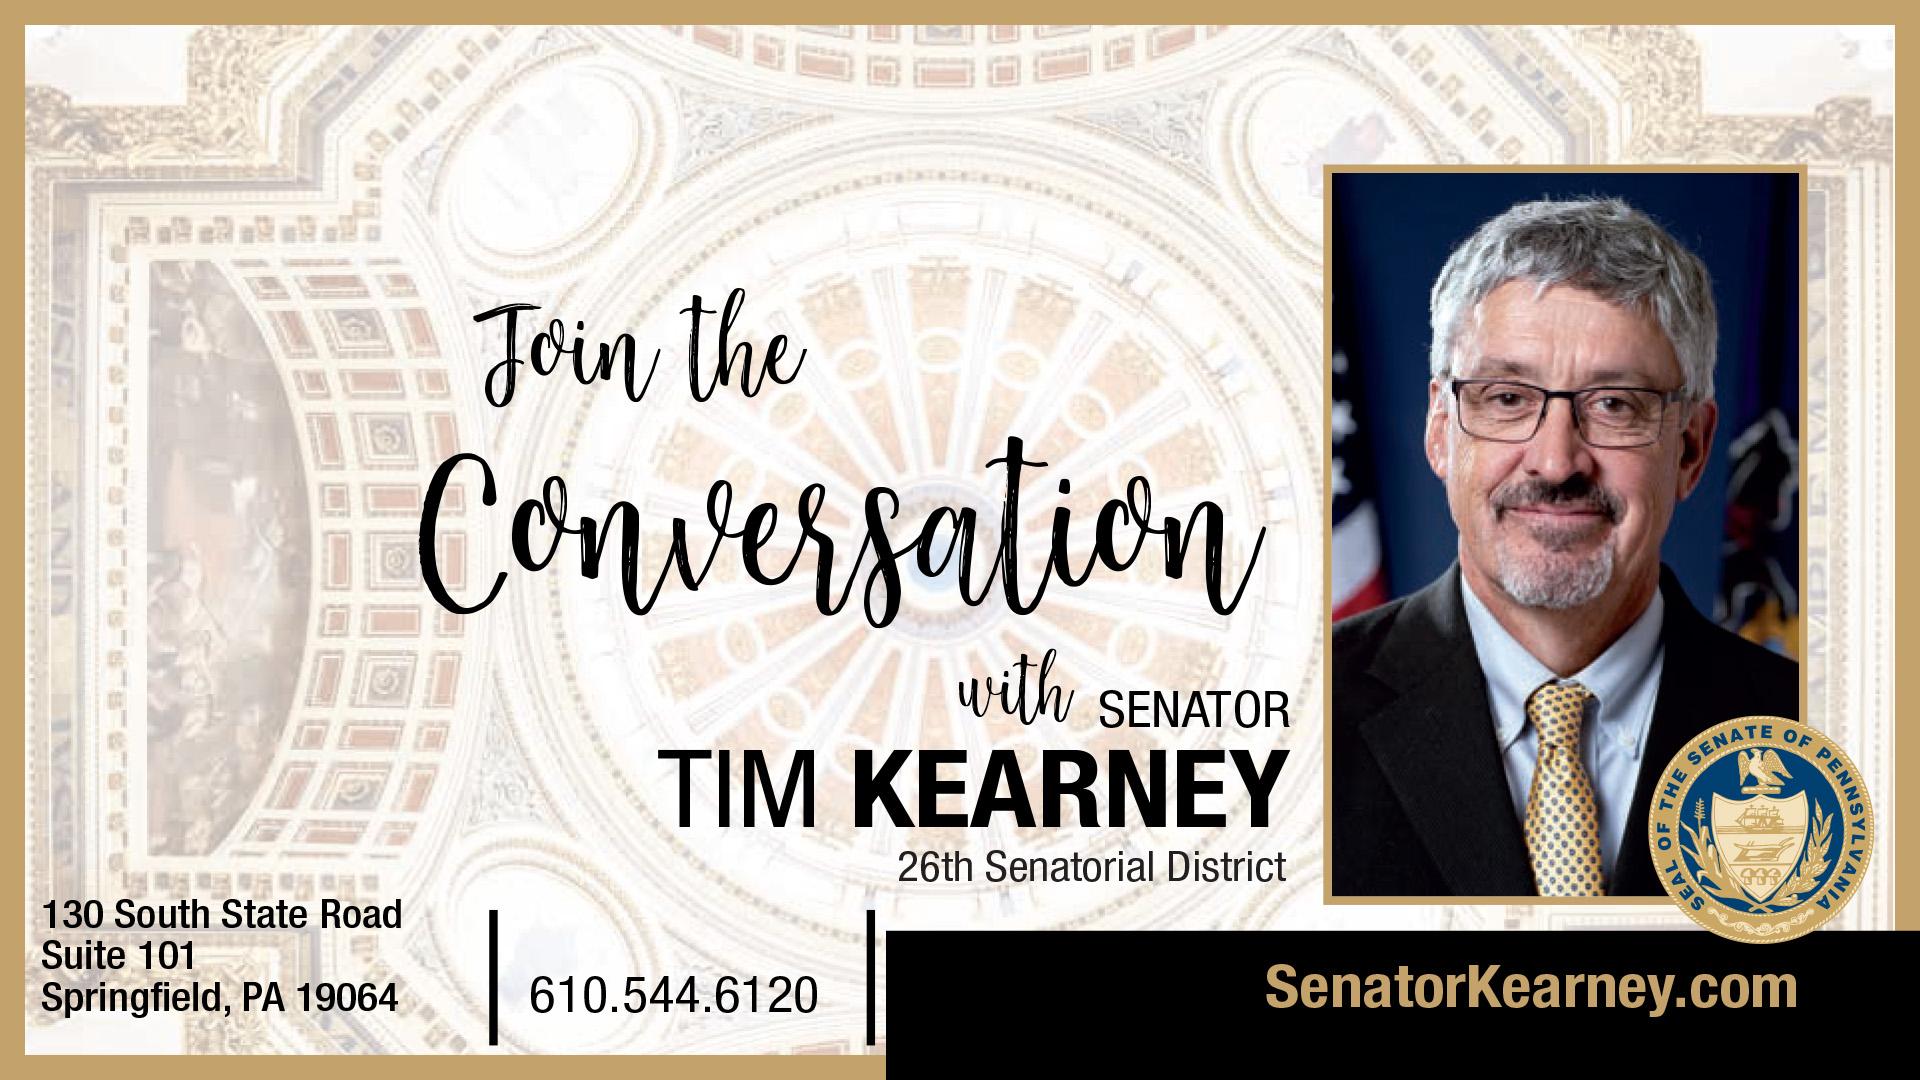 PA State Senator Tim Kearney